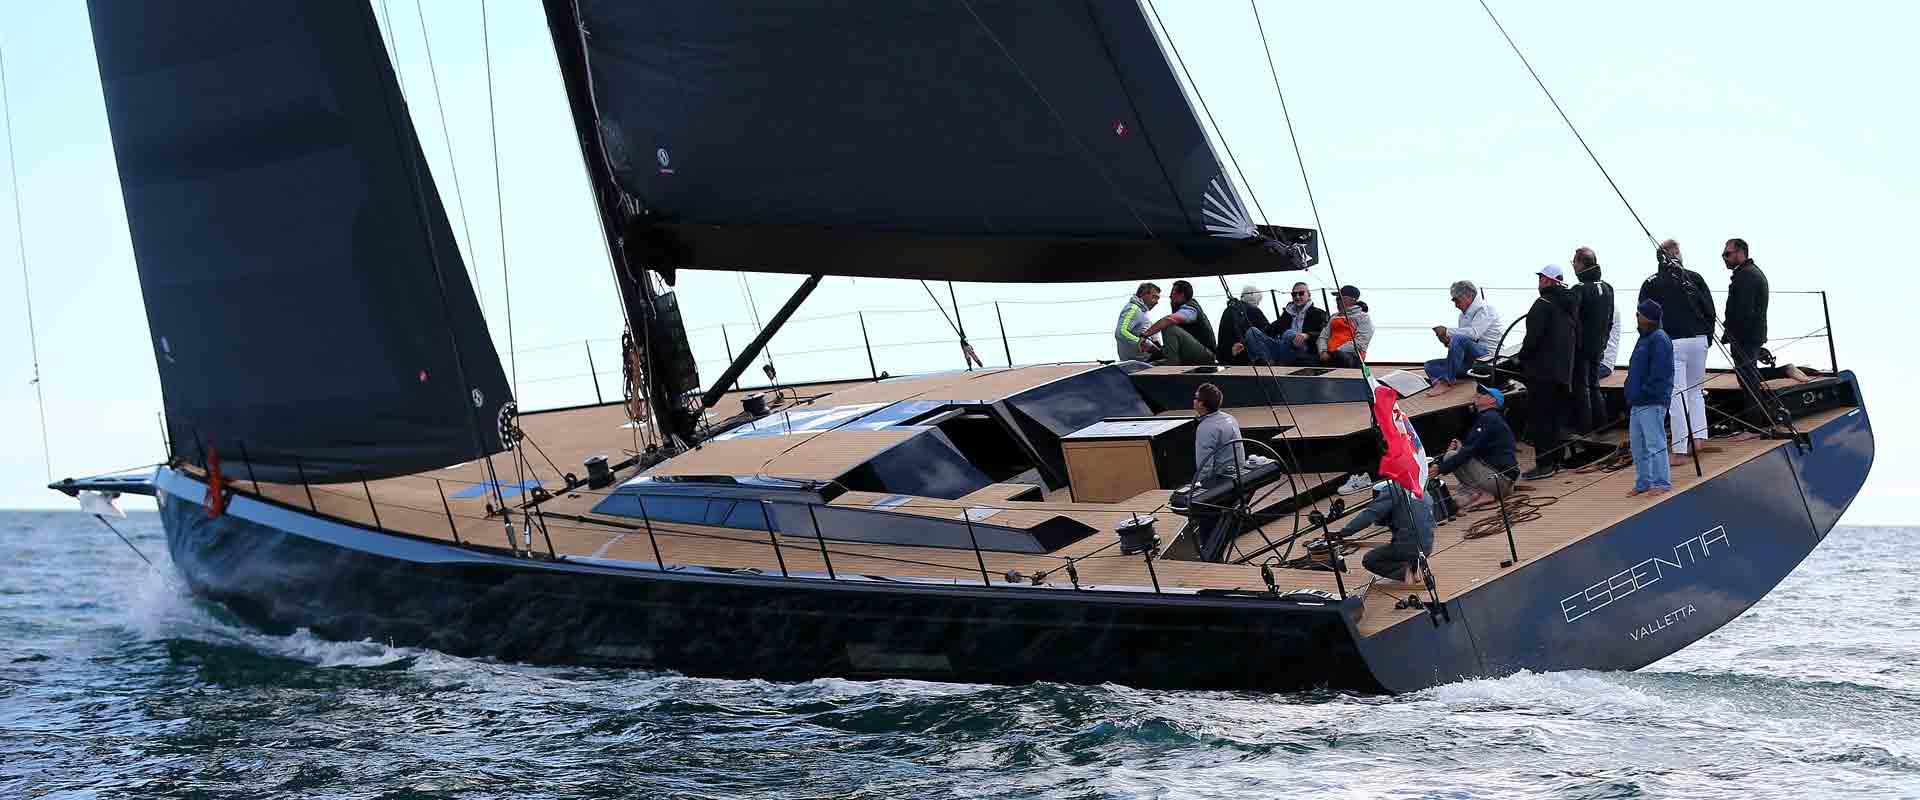 Maxy Yachts